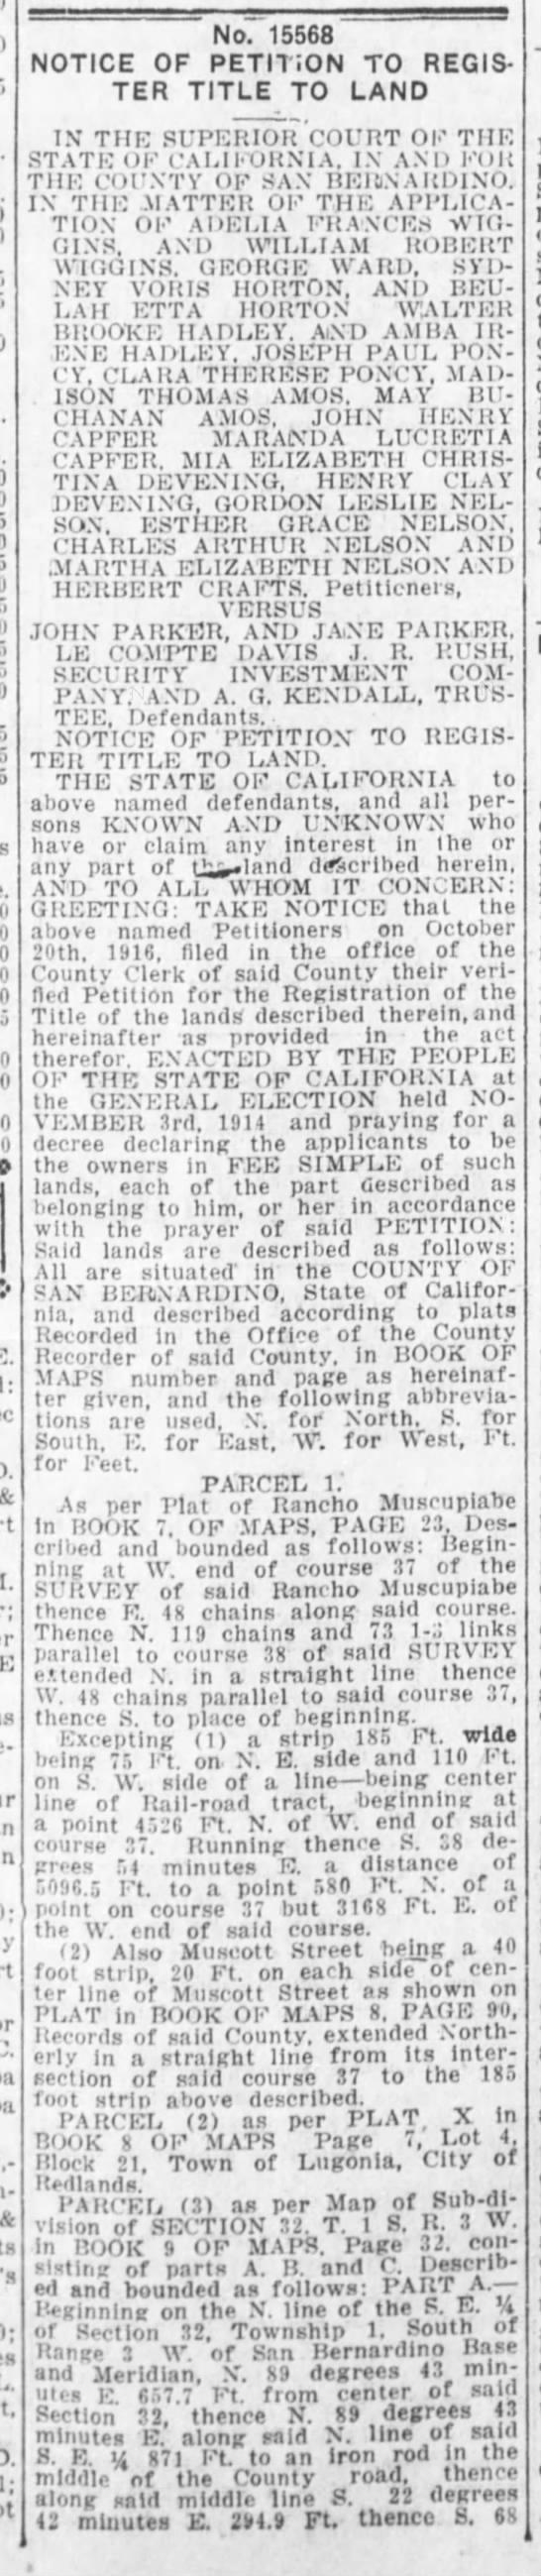 21 October 1916 Petition to register land SB Sun -